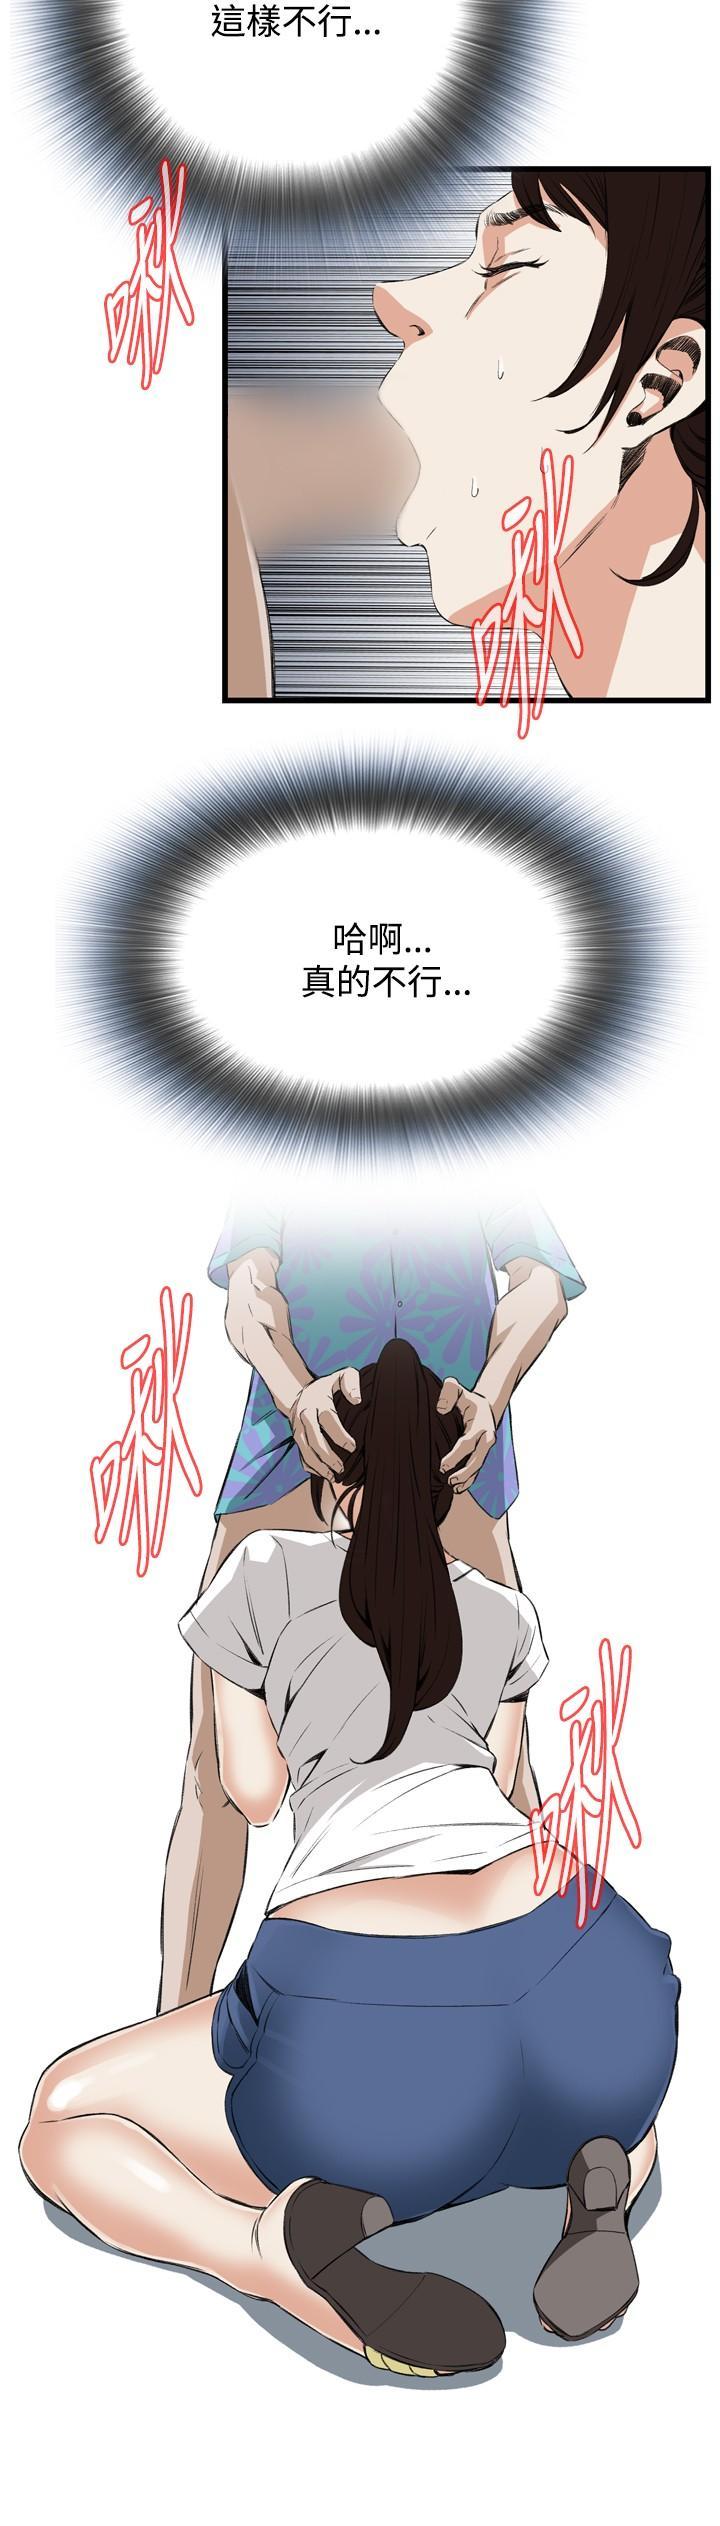 Take a Peek 偷窥 Ch.39~60 [Chinese]中文 358